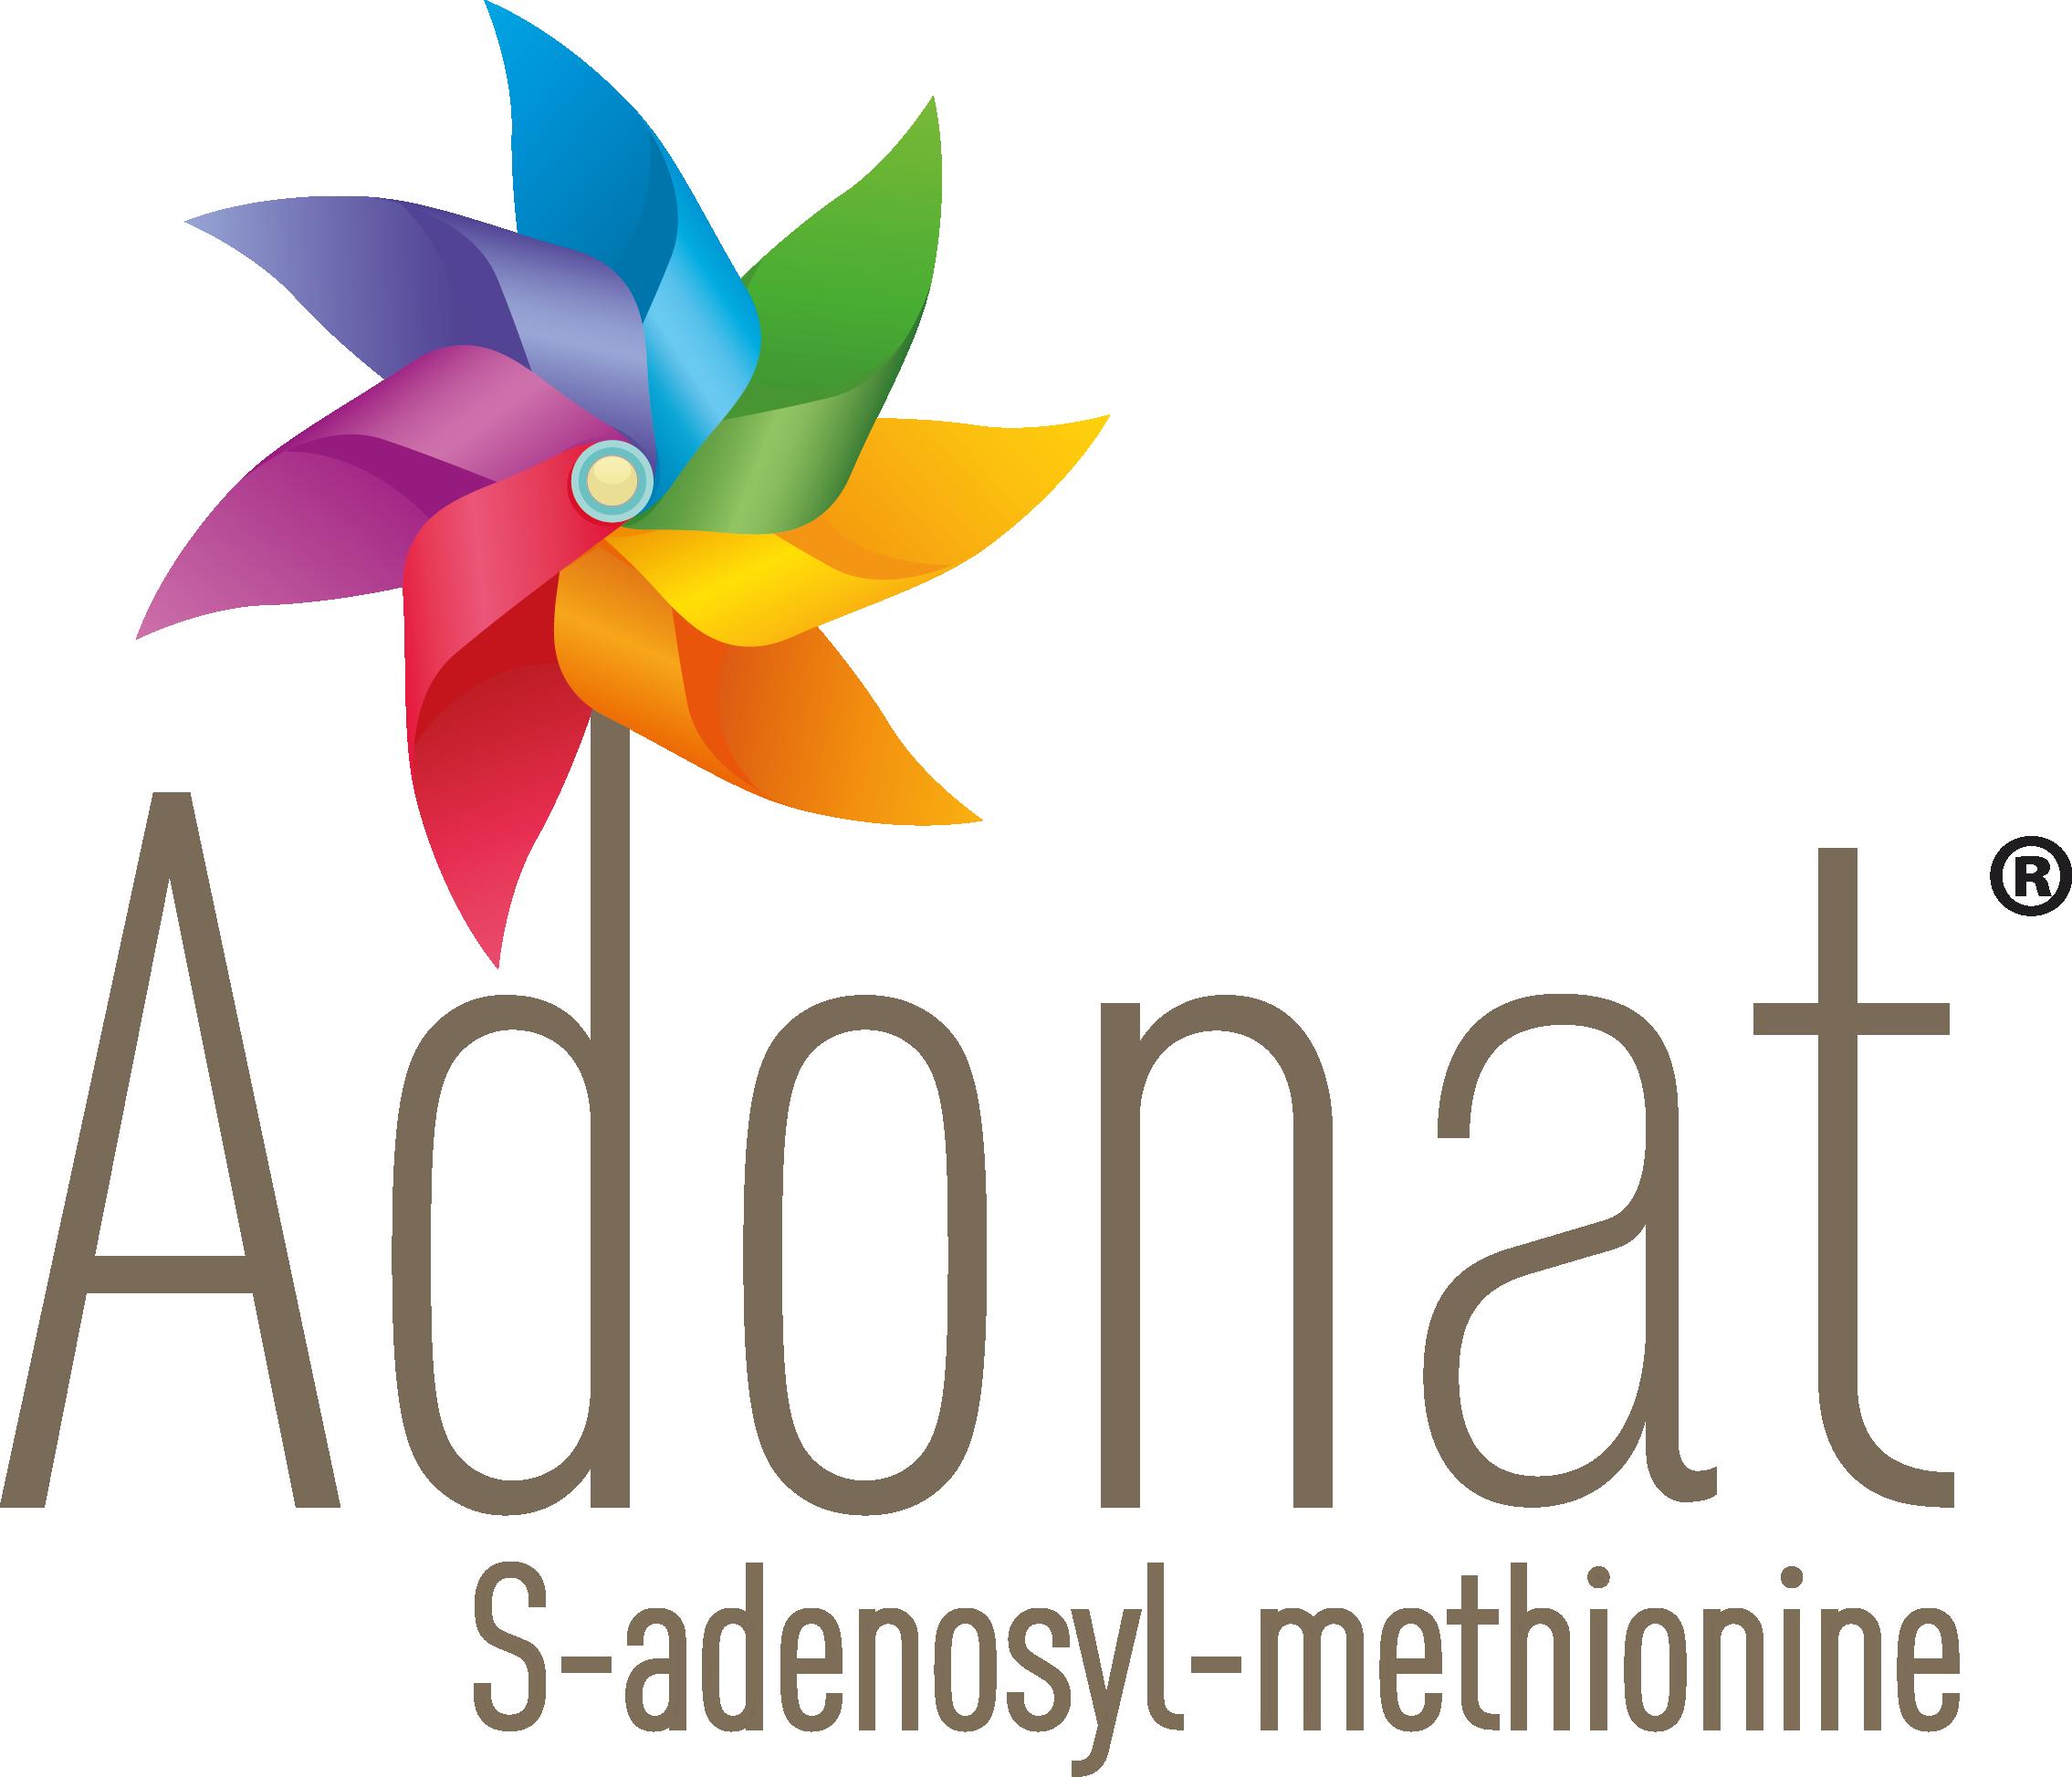 Adonat®